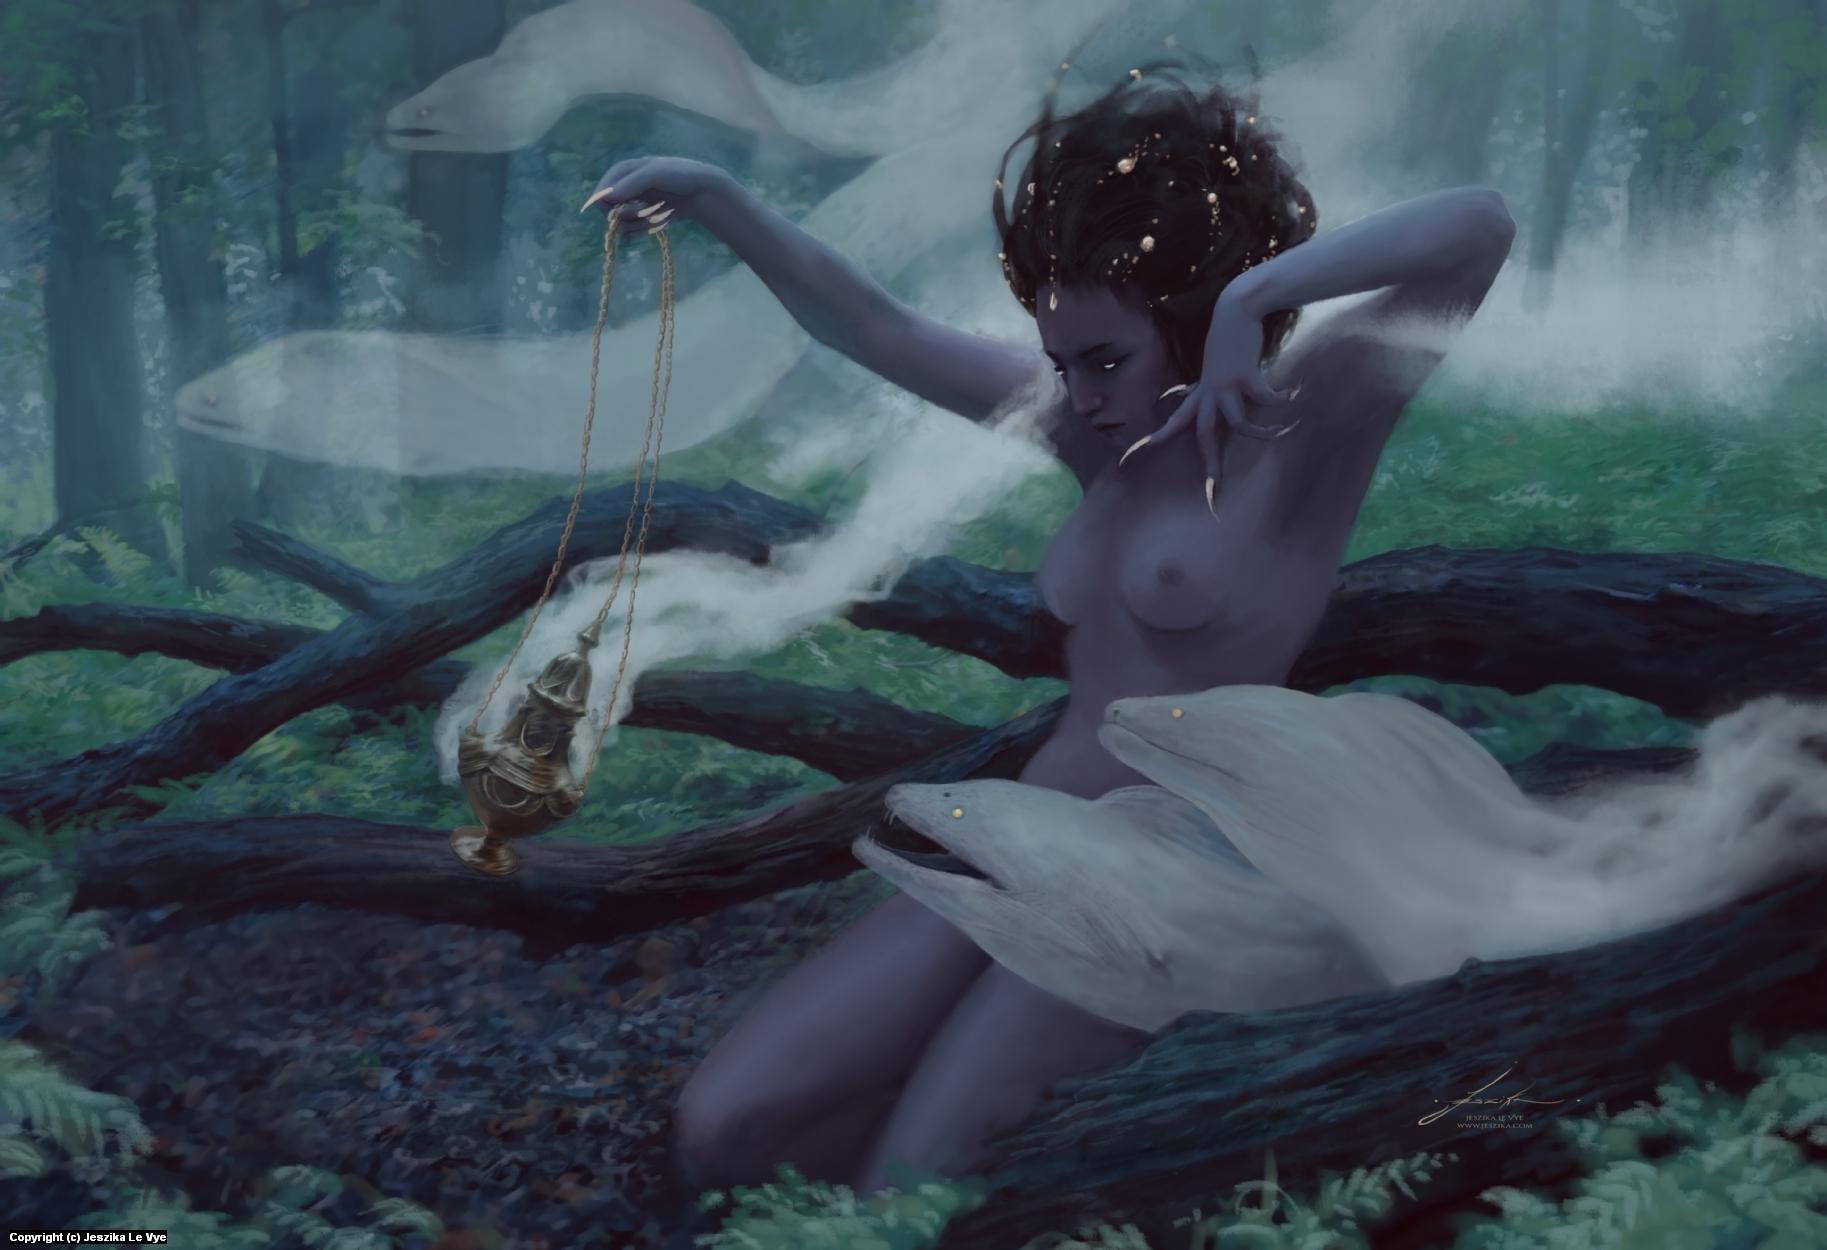 She Breathes Beasts Artwork by Jeszika Le Vye